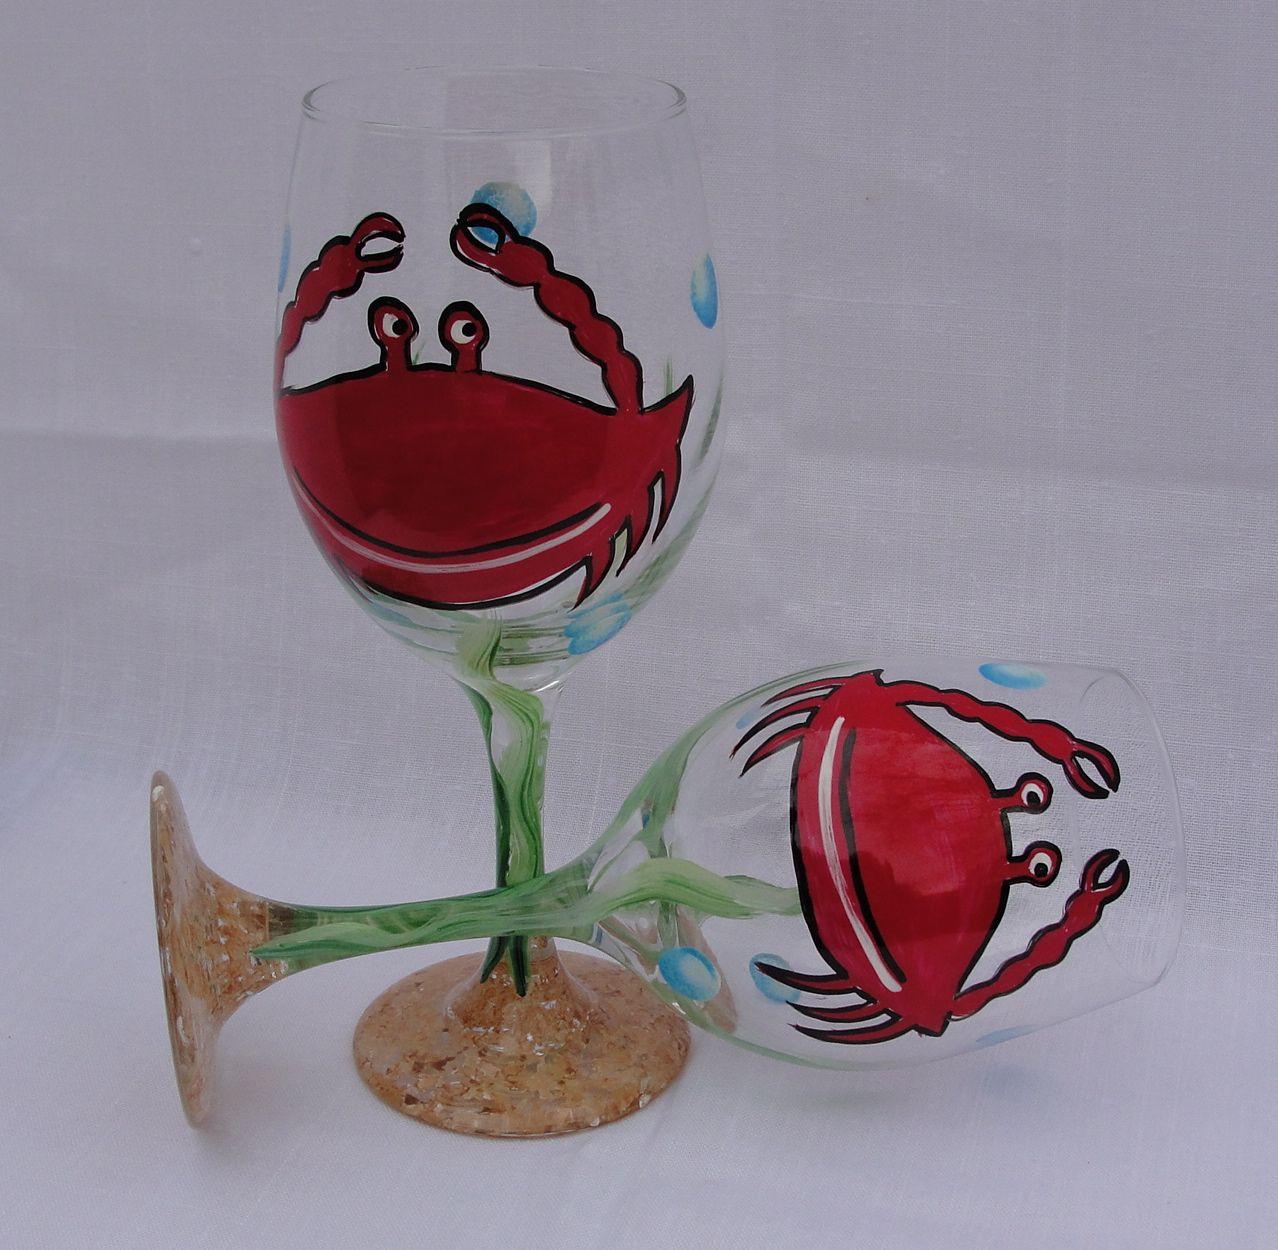 Red Crab Wine Glasses Decorated Wine Glasses Hand Painted Wine Glass Diy Wine Glasses Painted